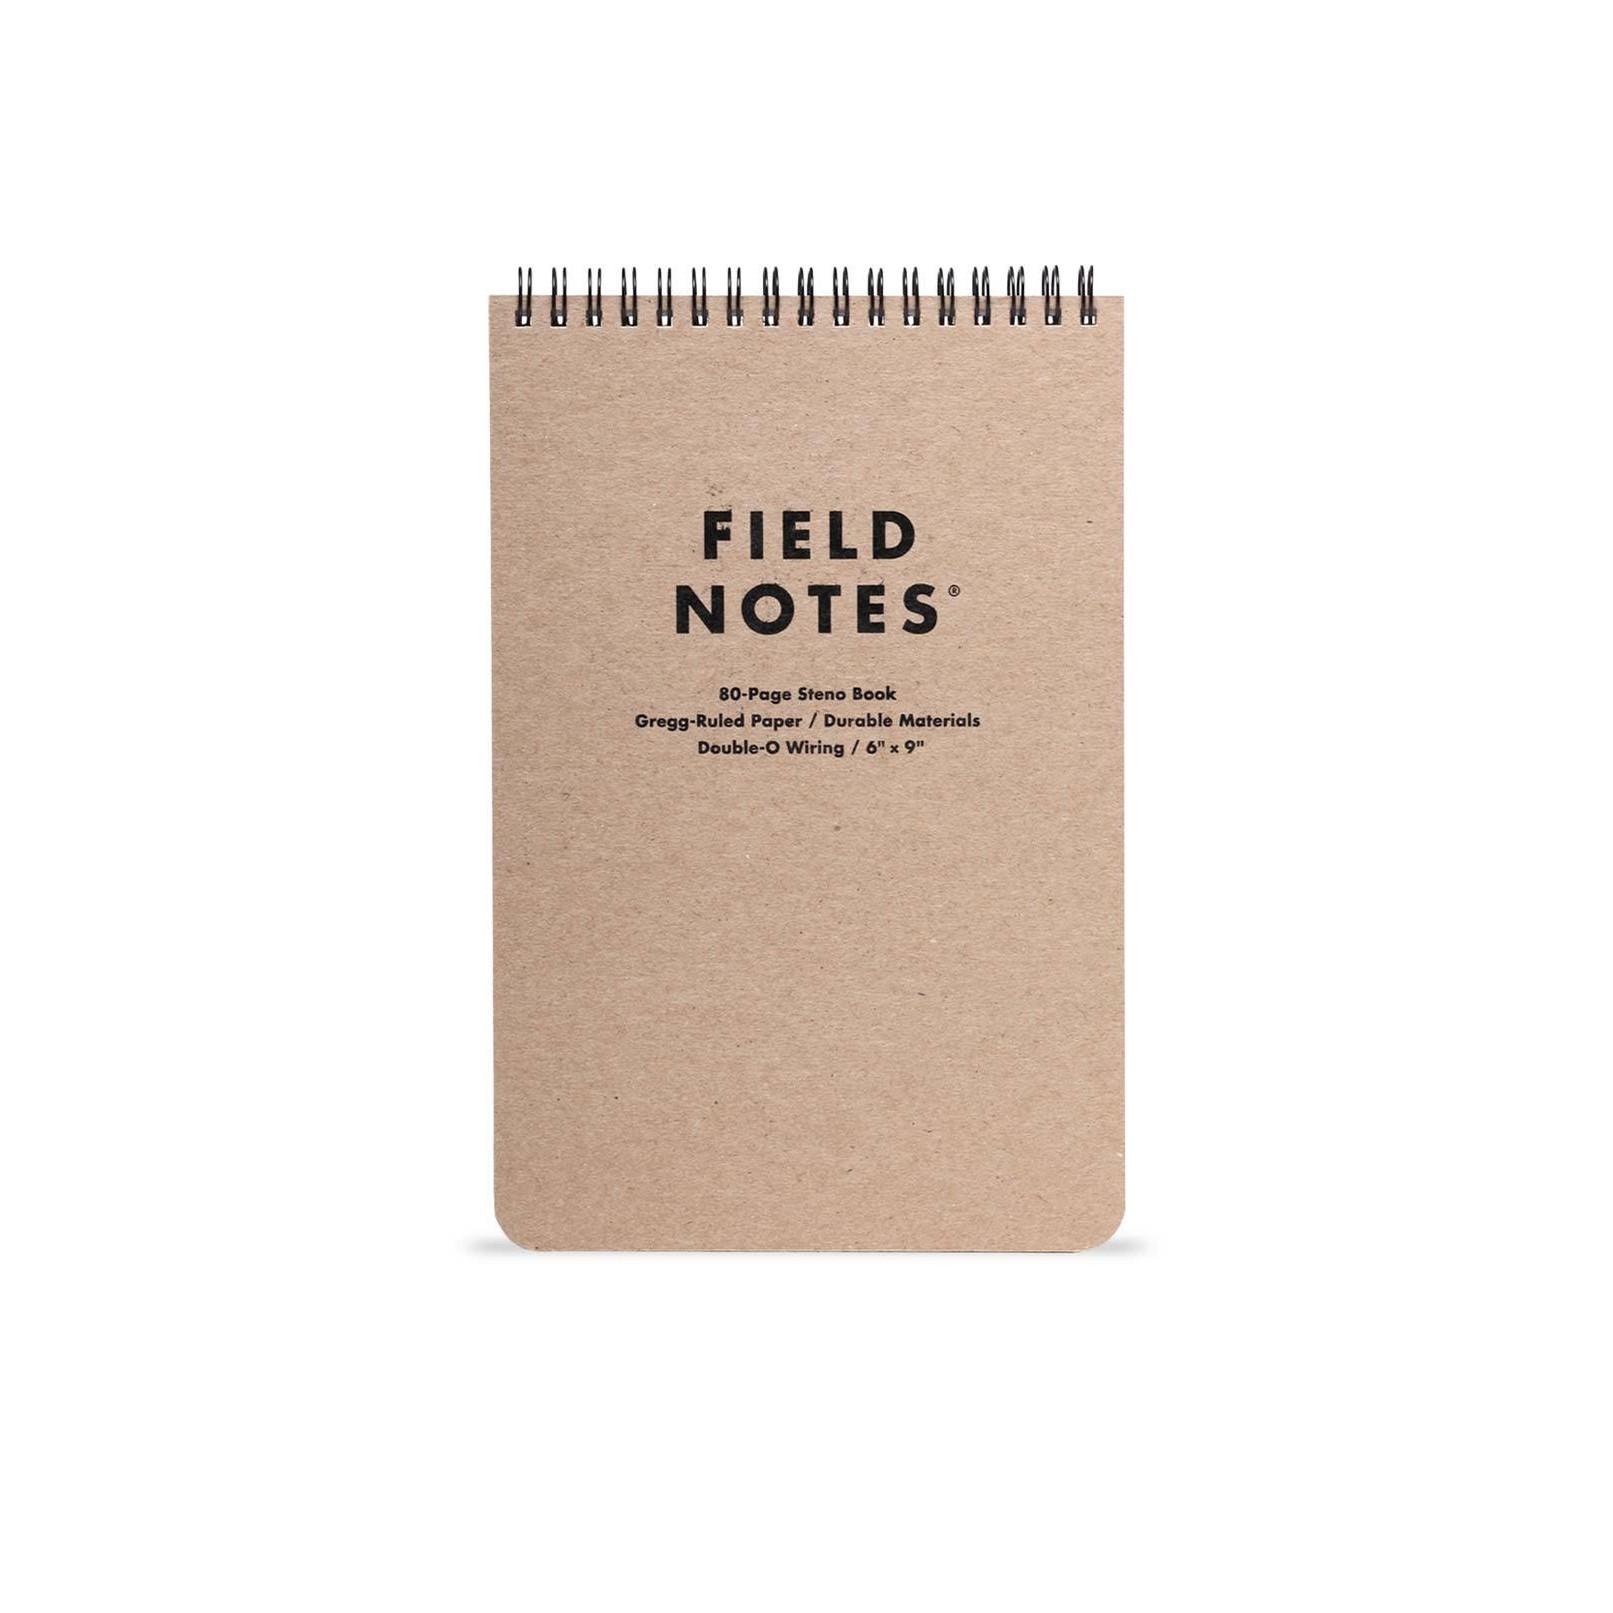 Field Notes Steno